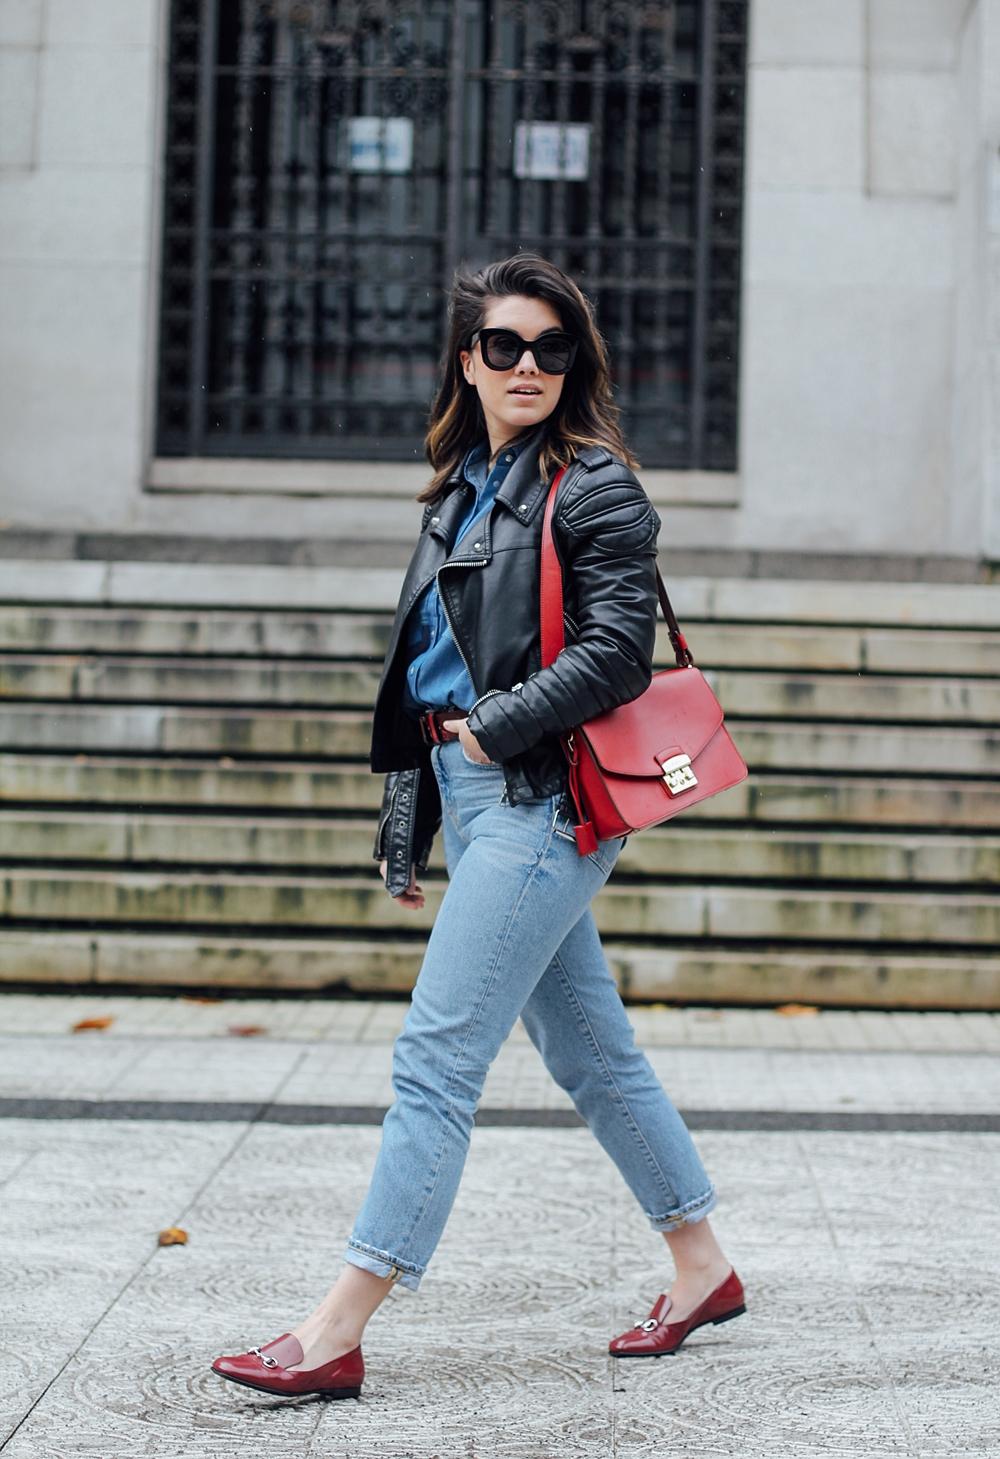 camisa patchwork total look denim ties and heels blouse with furla metropolis bag